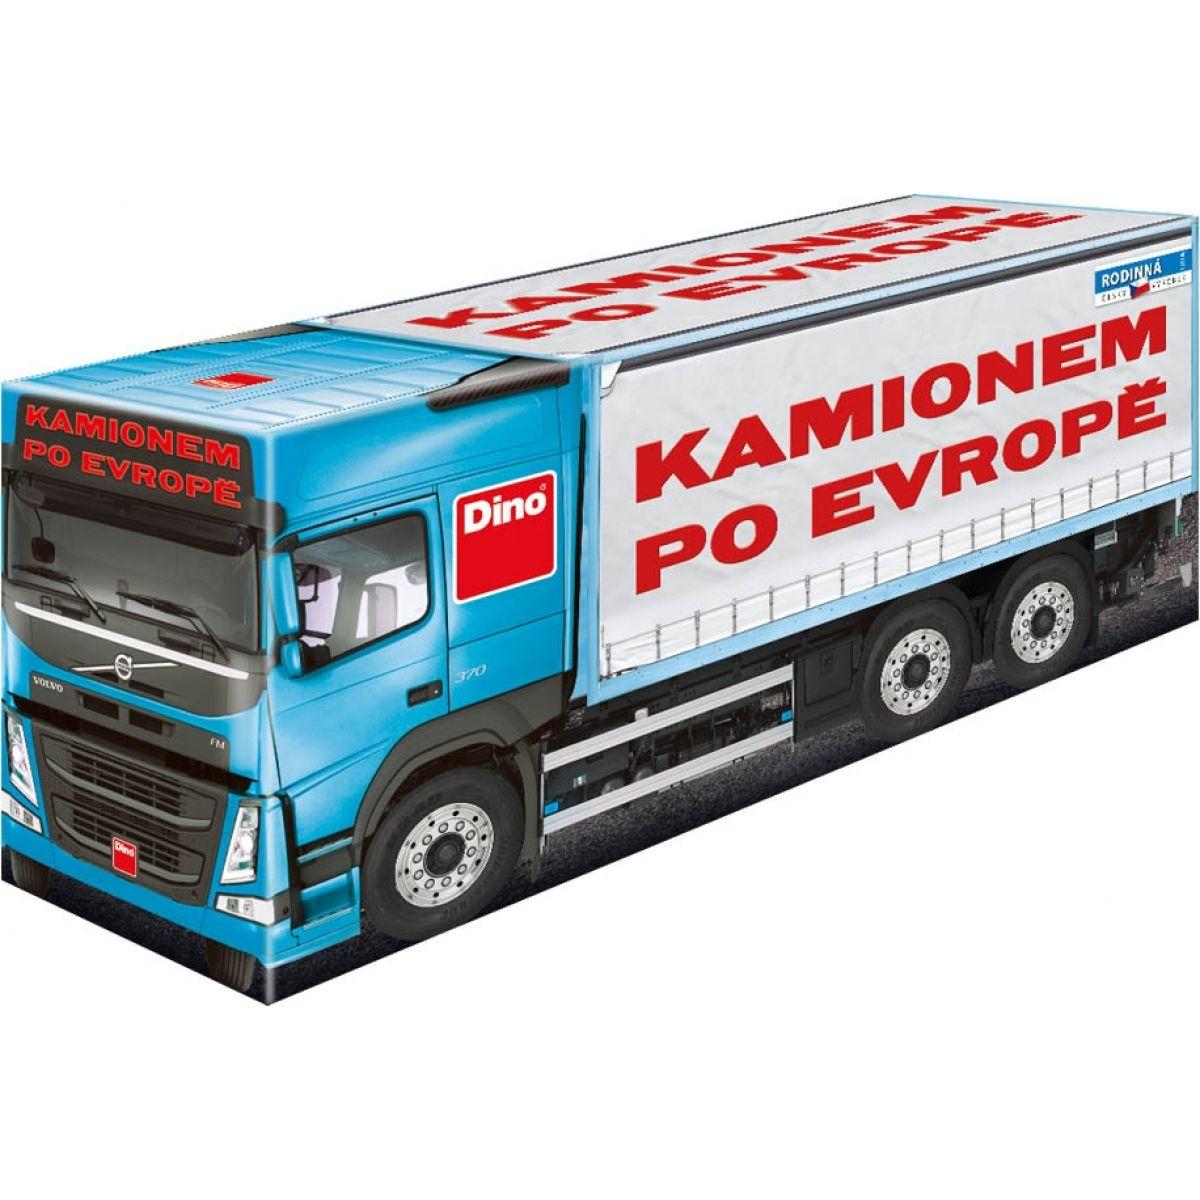 Dino Kamionem po Evropě - Poškodený obal